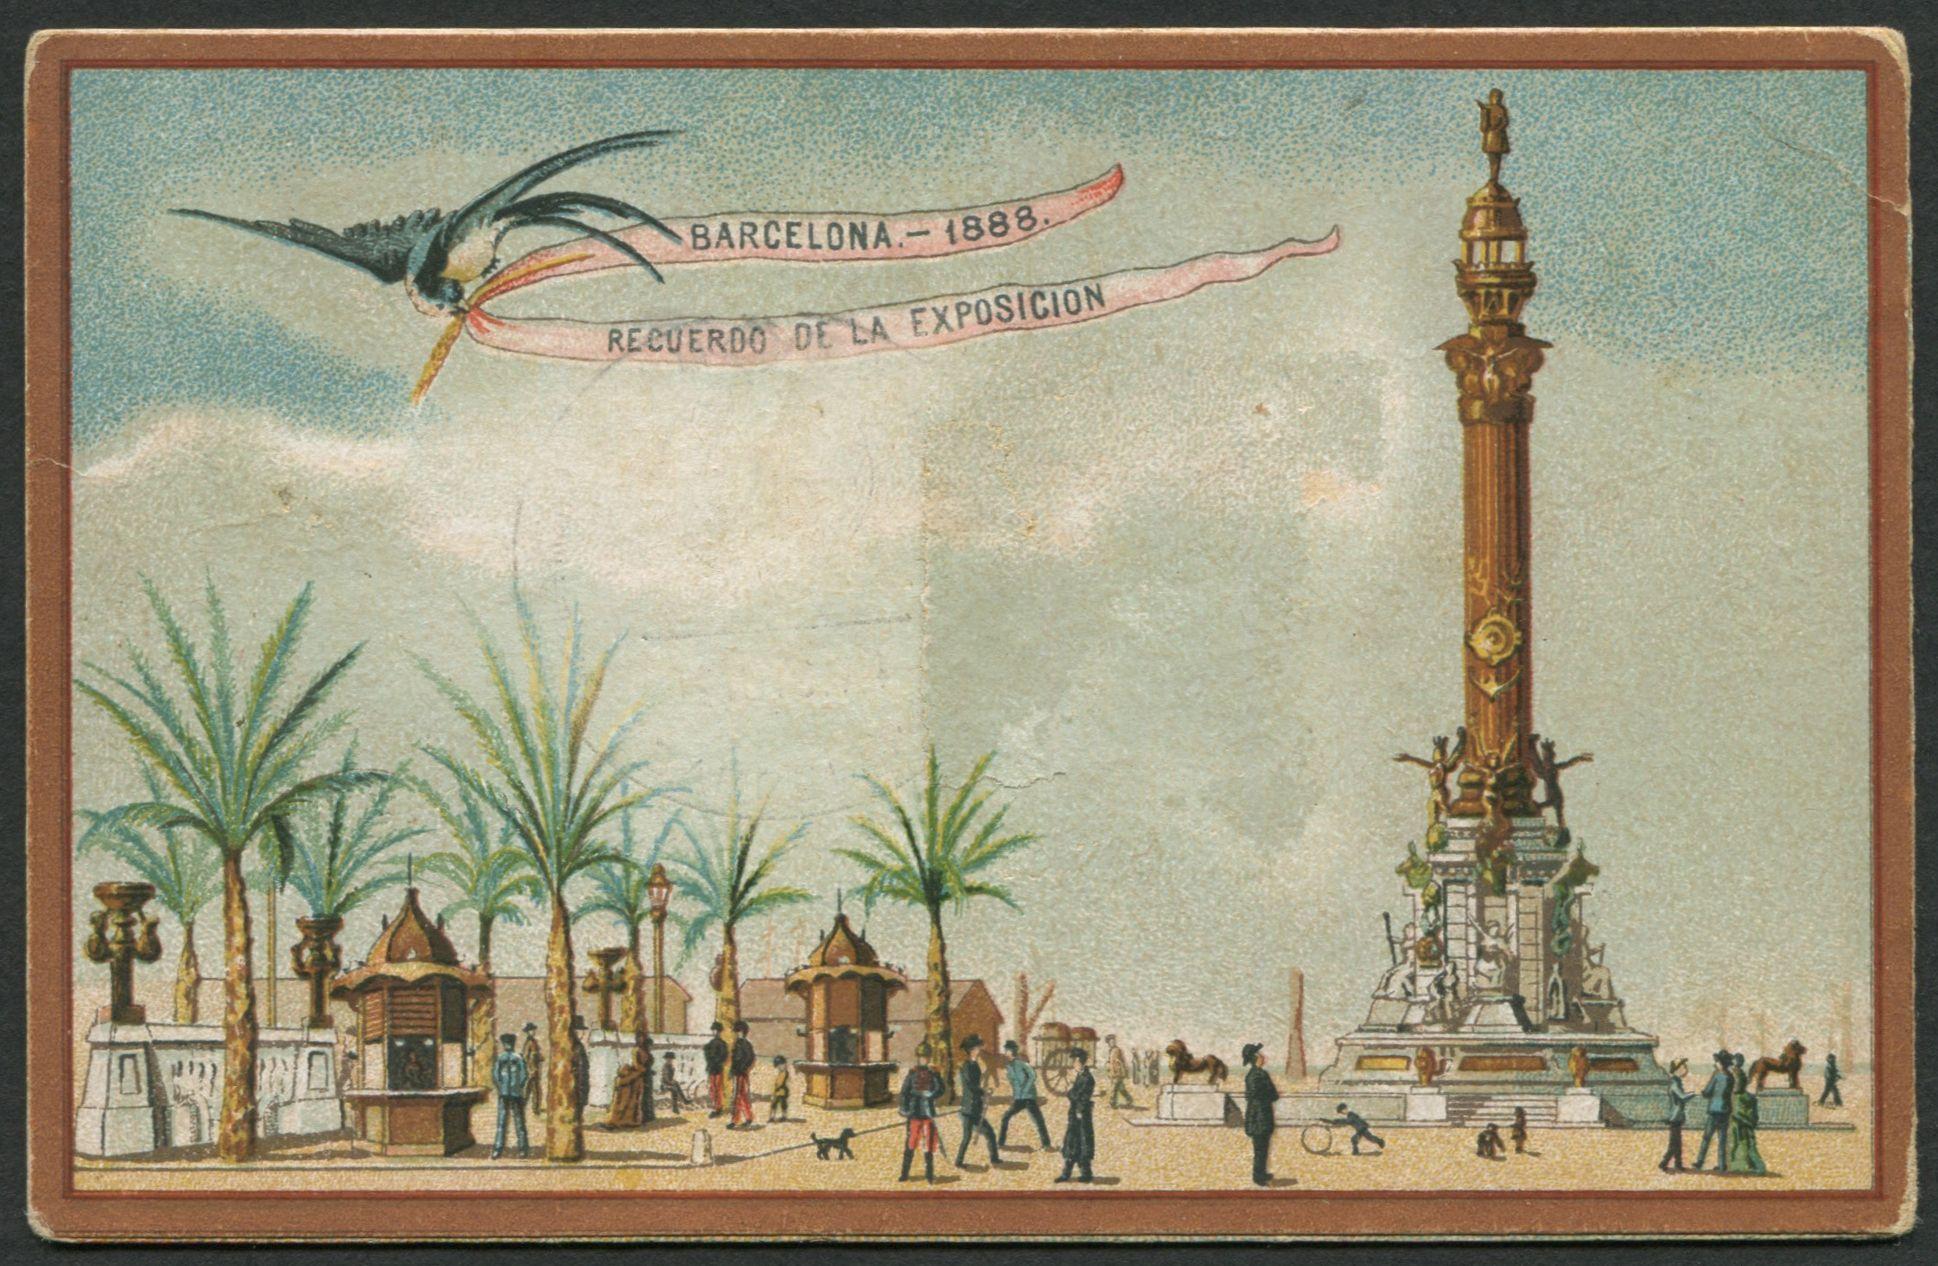 1888 Barcelona Universal Exposition